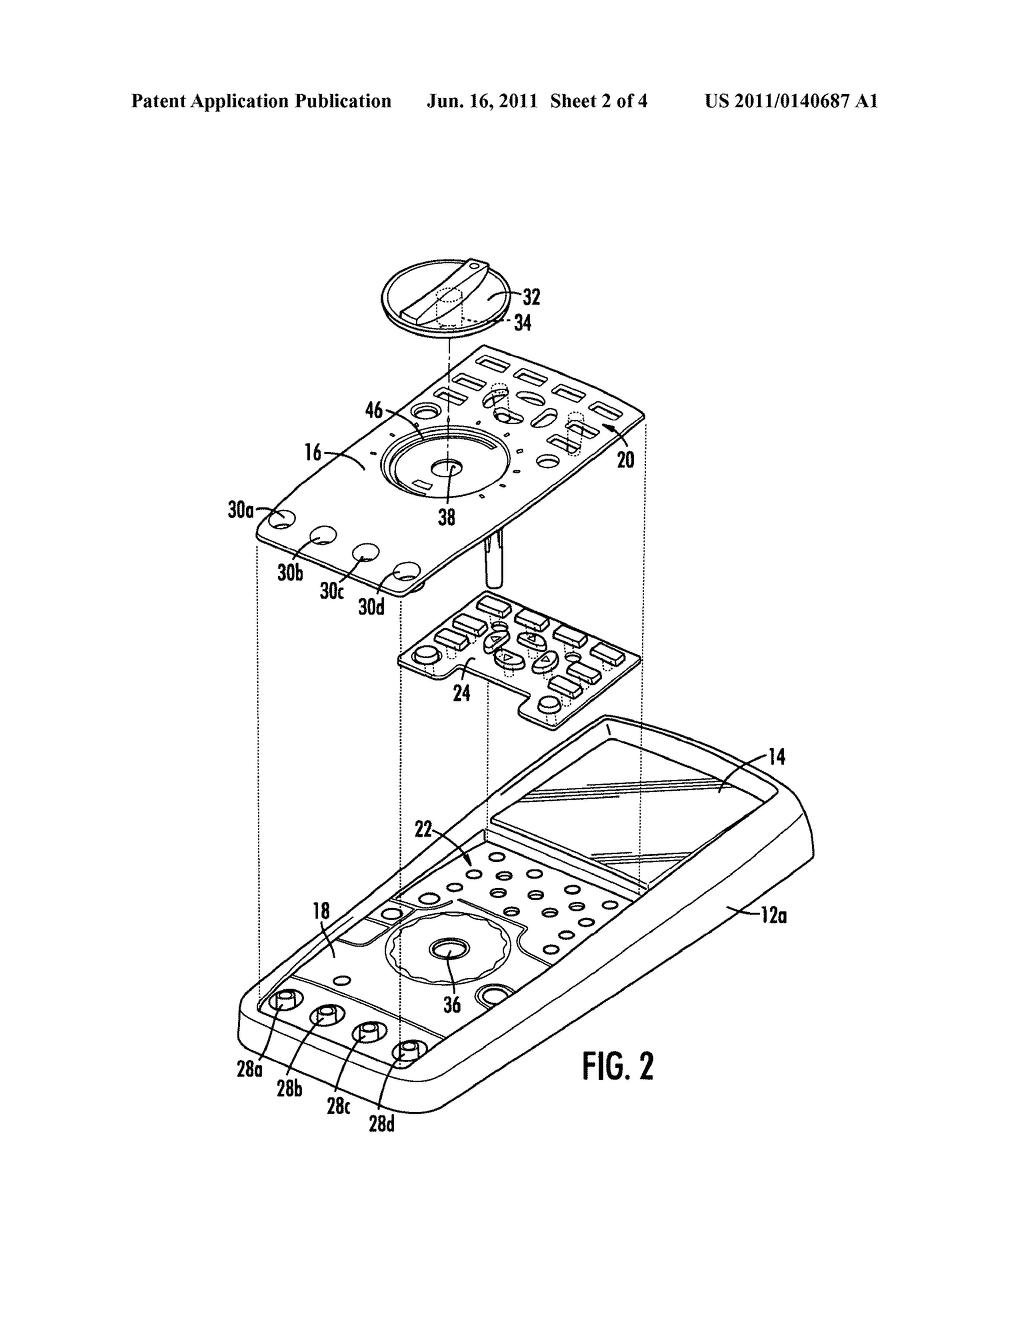 Digital Multimeter Schematic Diagrams Dt830d Circuit Diagram Having Case Panel Structure Voltage Reader